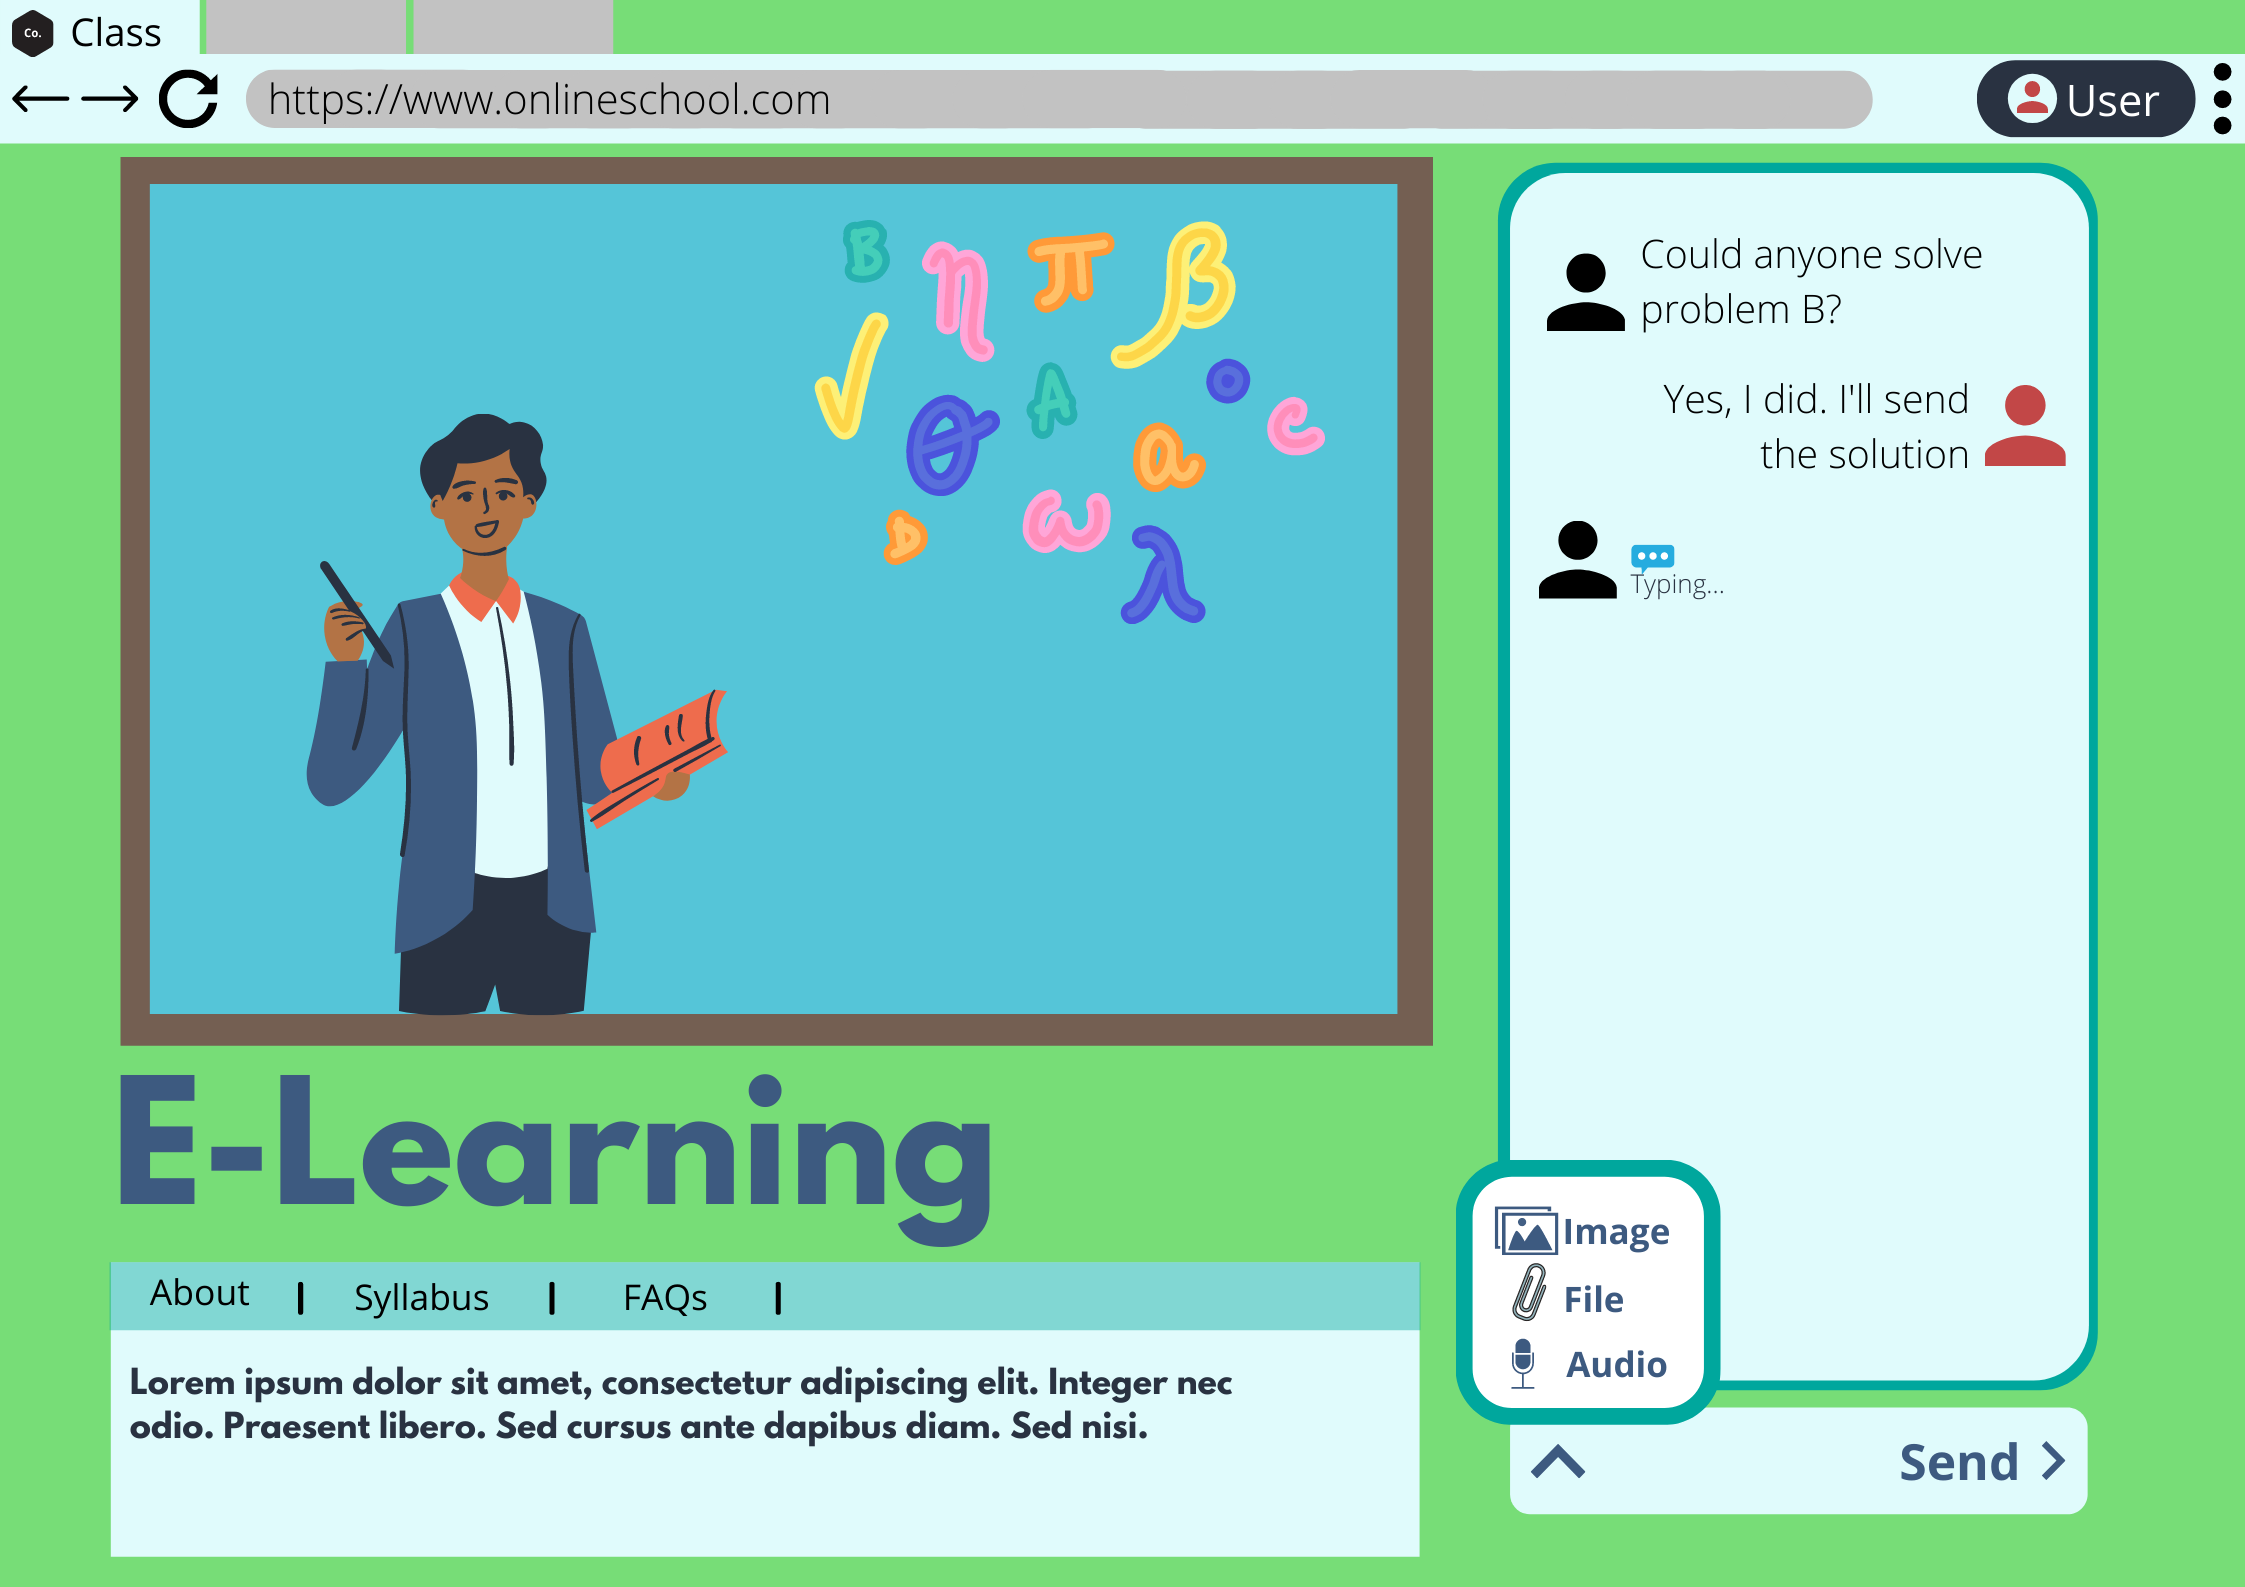 Image of virtual classroom